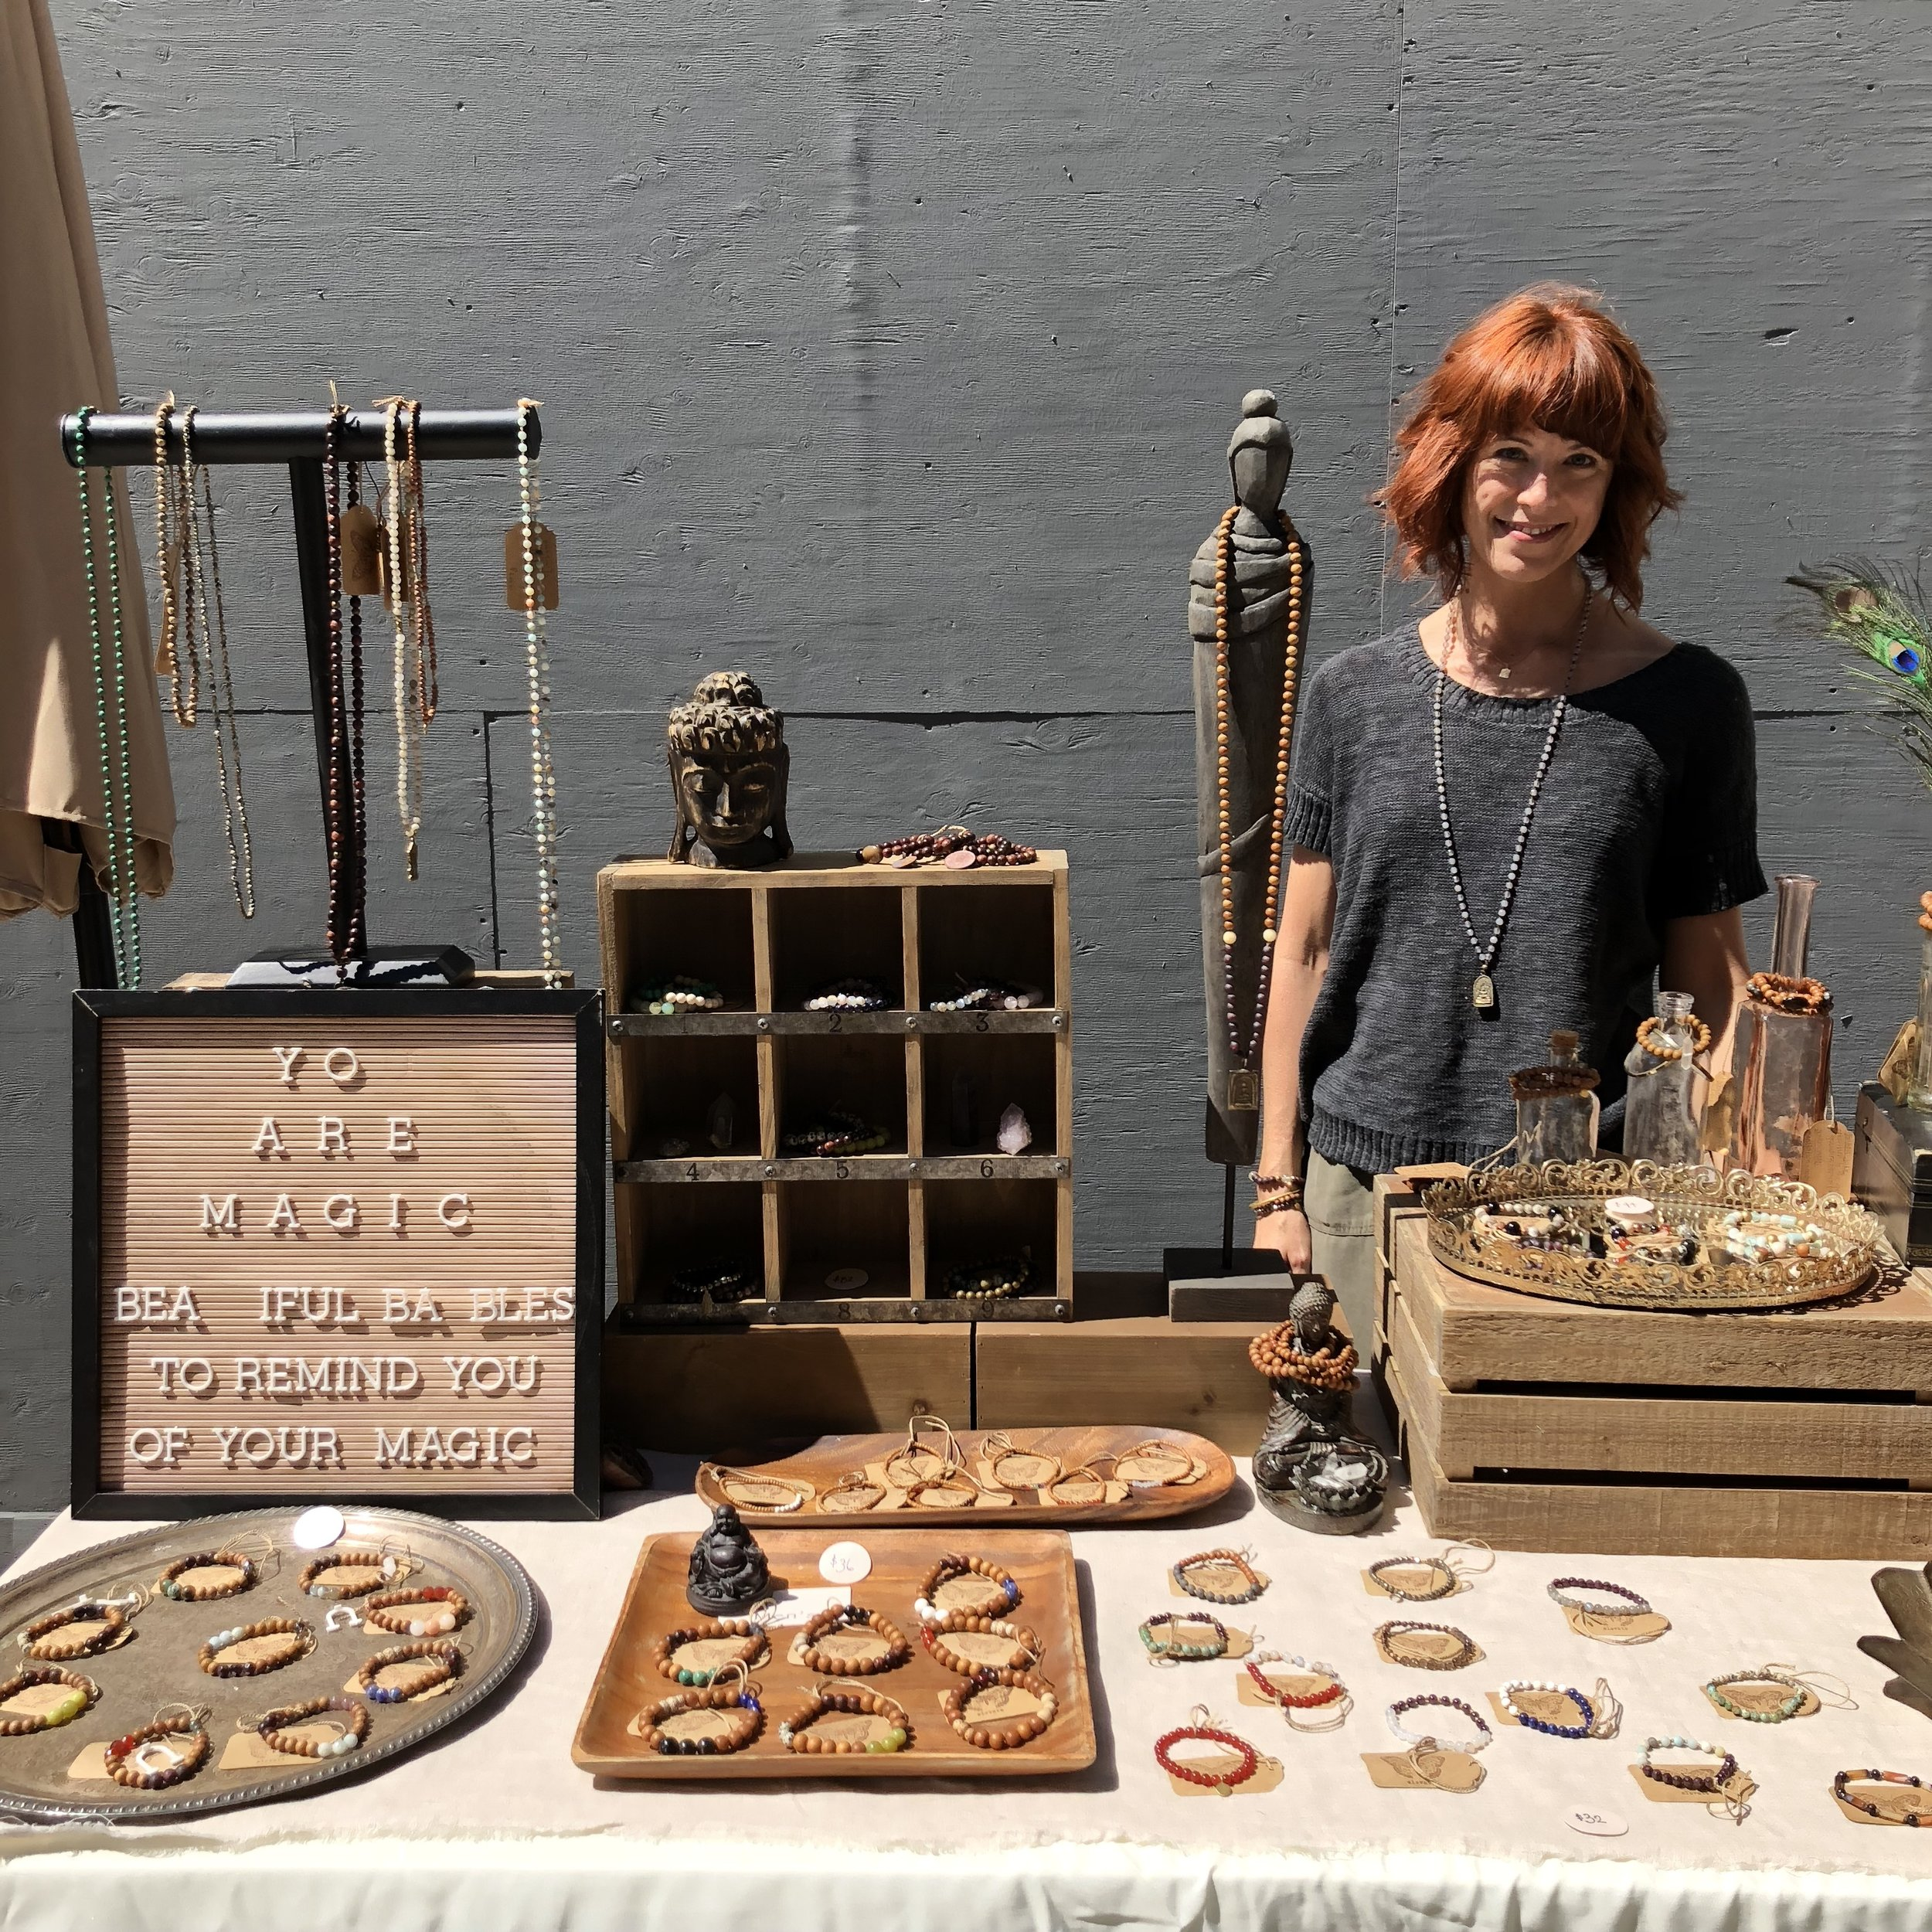 Dawn Hoppe - Yoga Instructor, Creator of Elevate Magic Jewelry